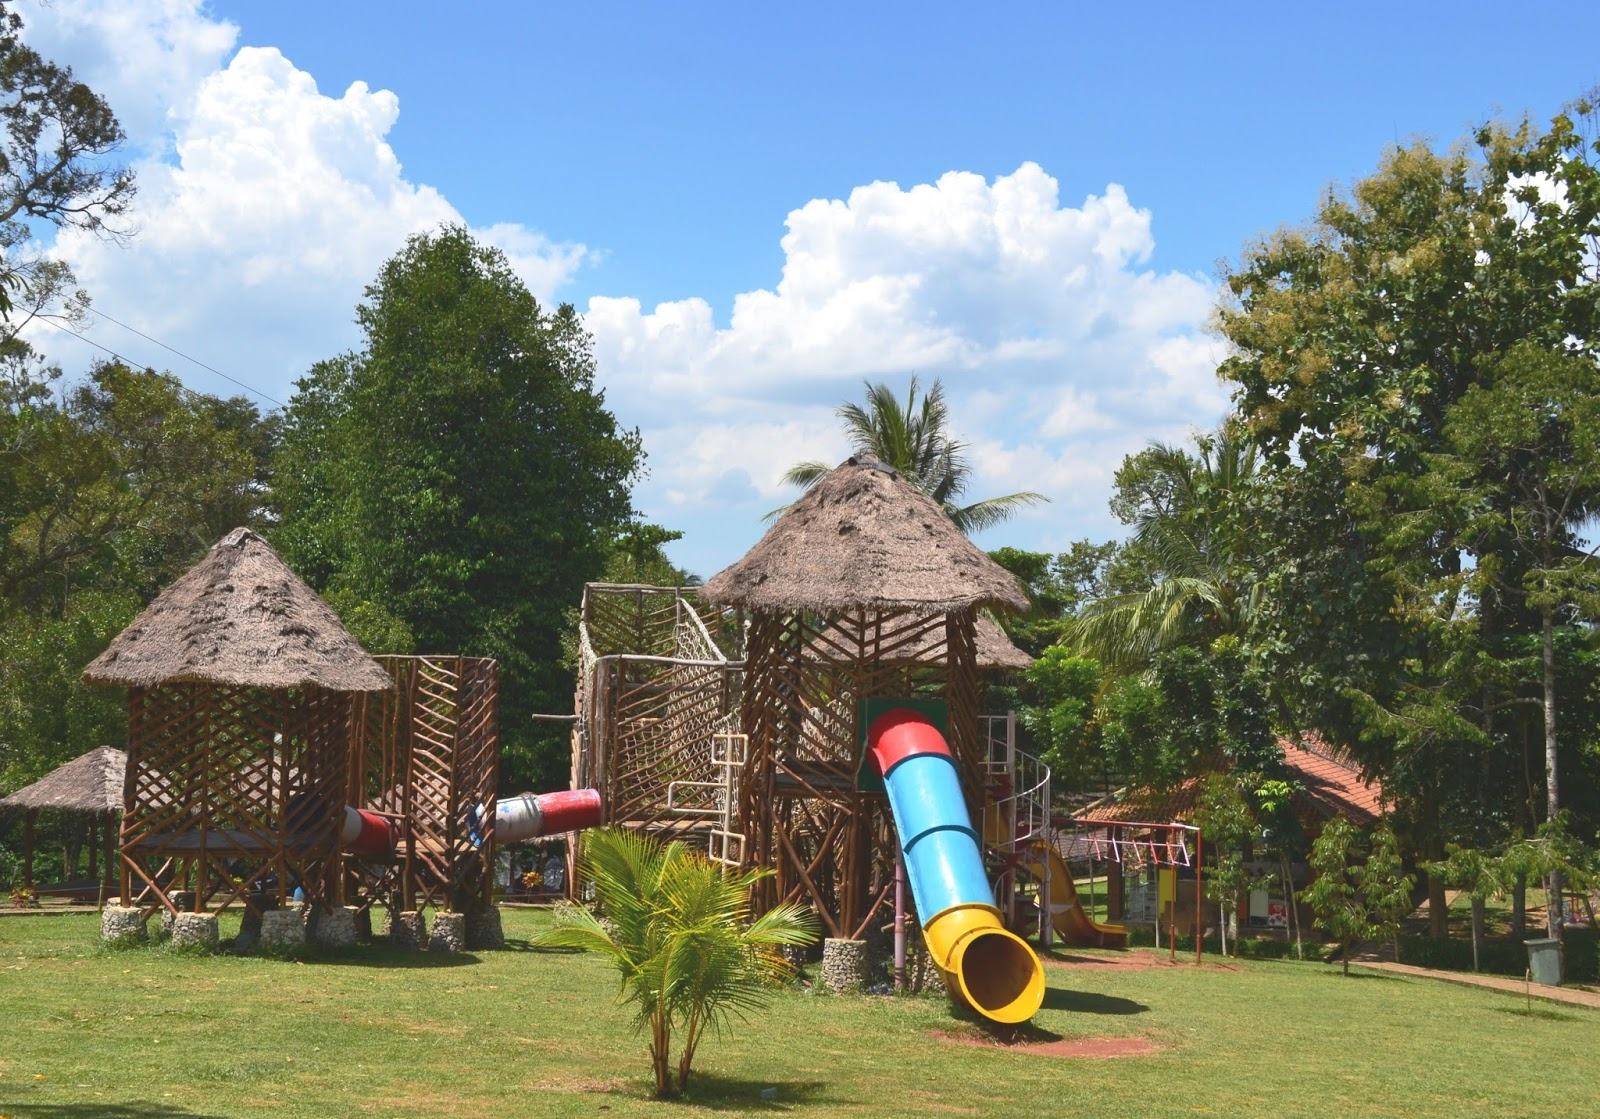 Lembah Hijau Lampung Ragam Wisata Indonesia Taman Kota Bandar